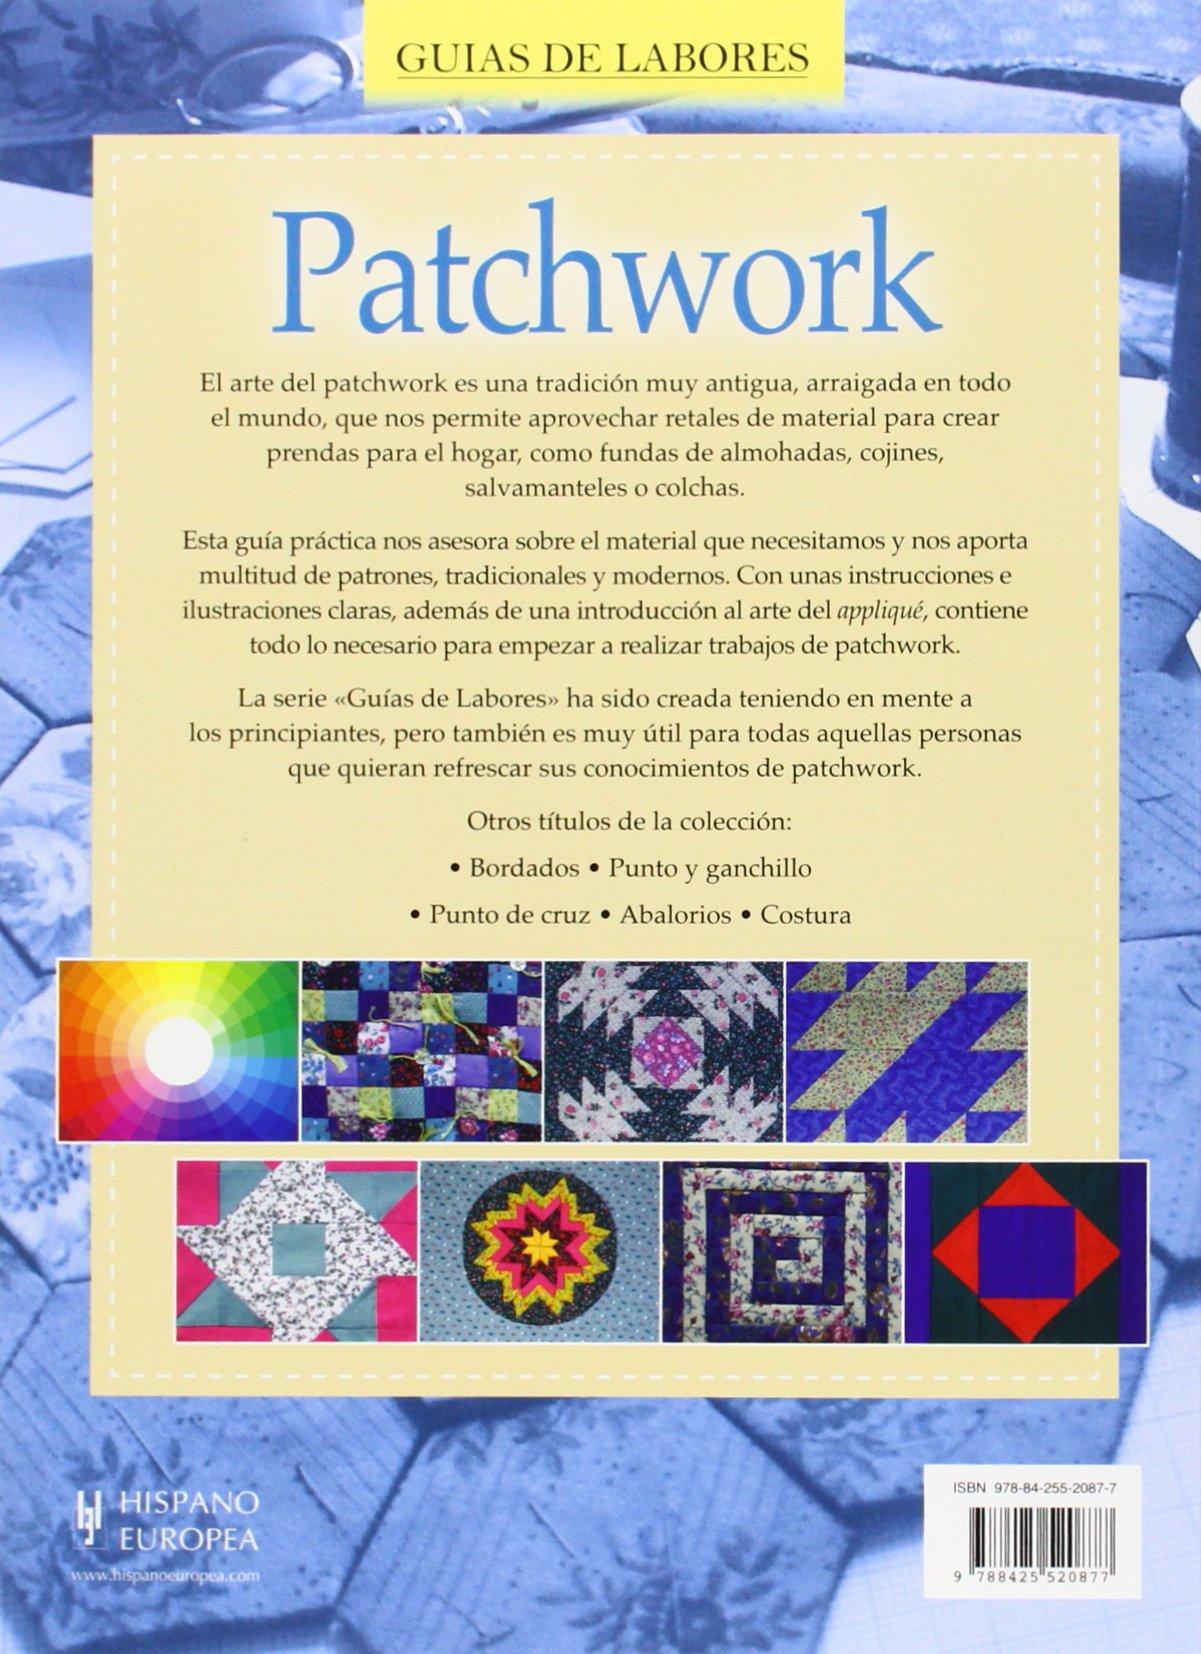 Patchwork (Guías de labores): Amazon.es: Charlotte Gerlings ...